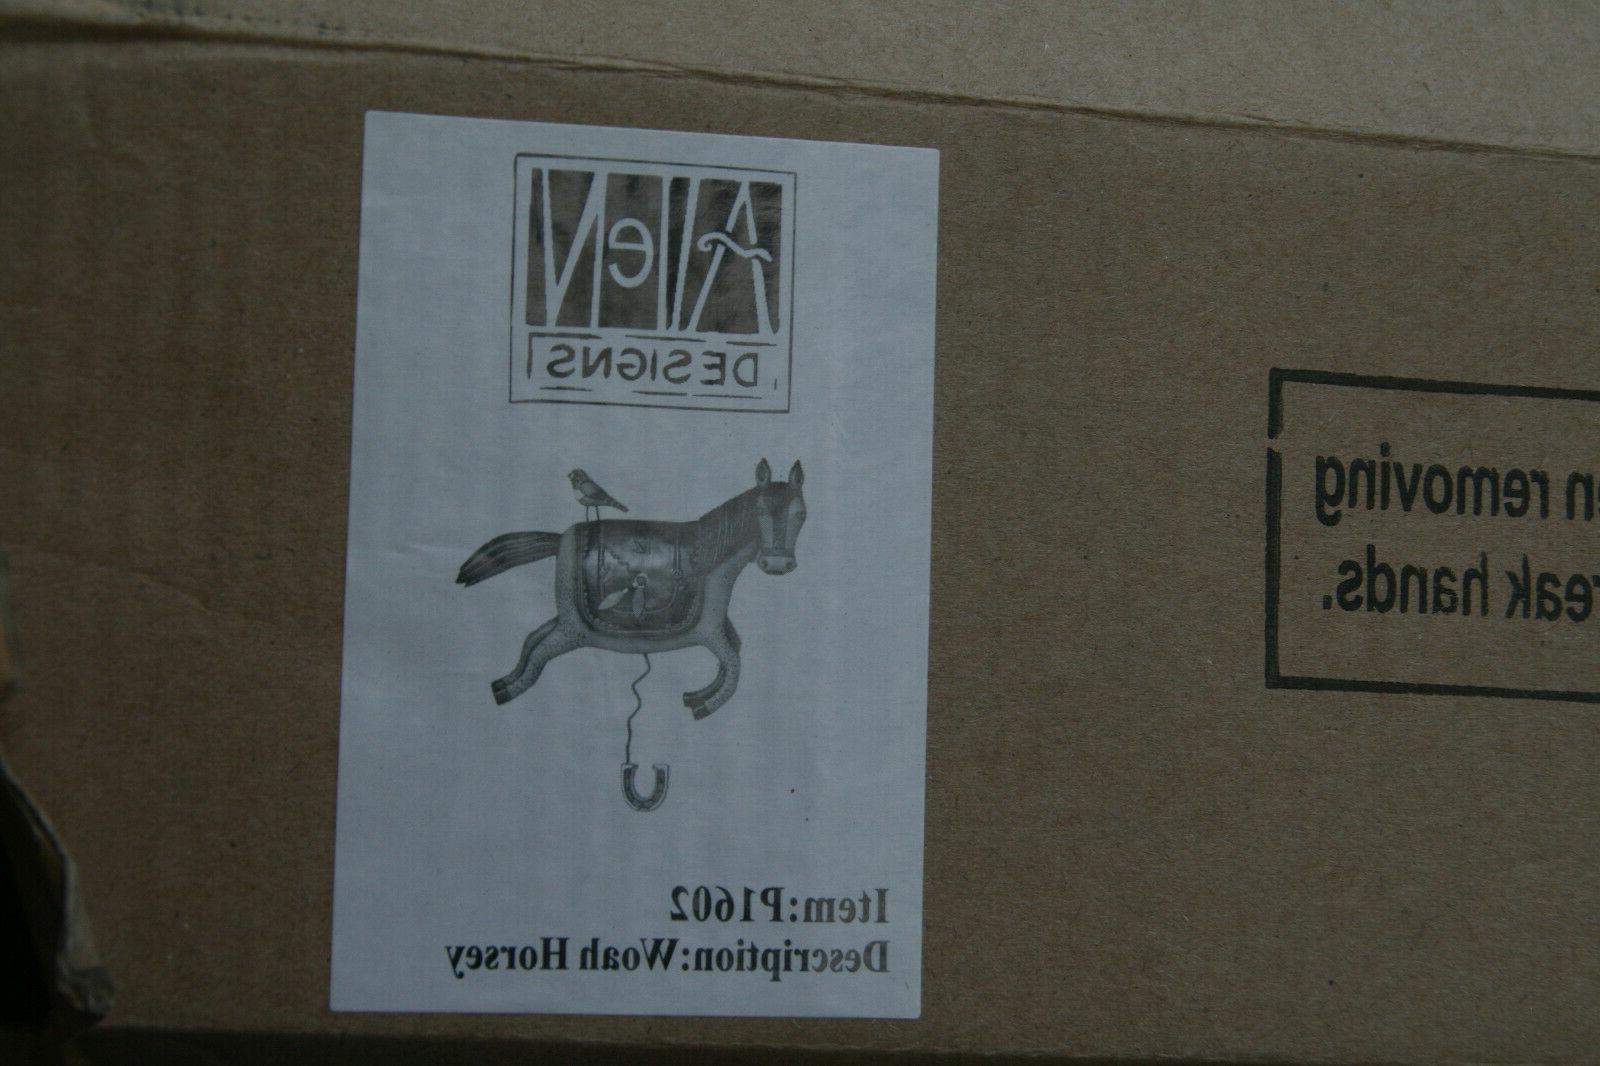 Allen Designs Horse Childs Whimsical